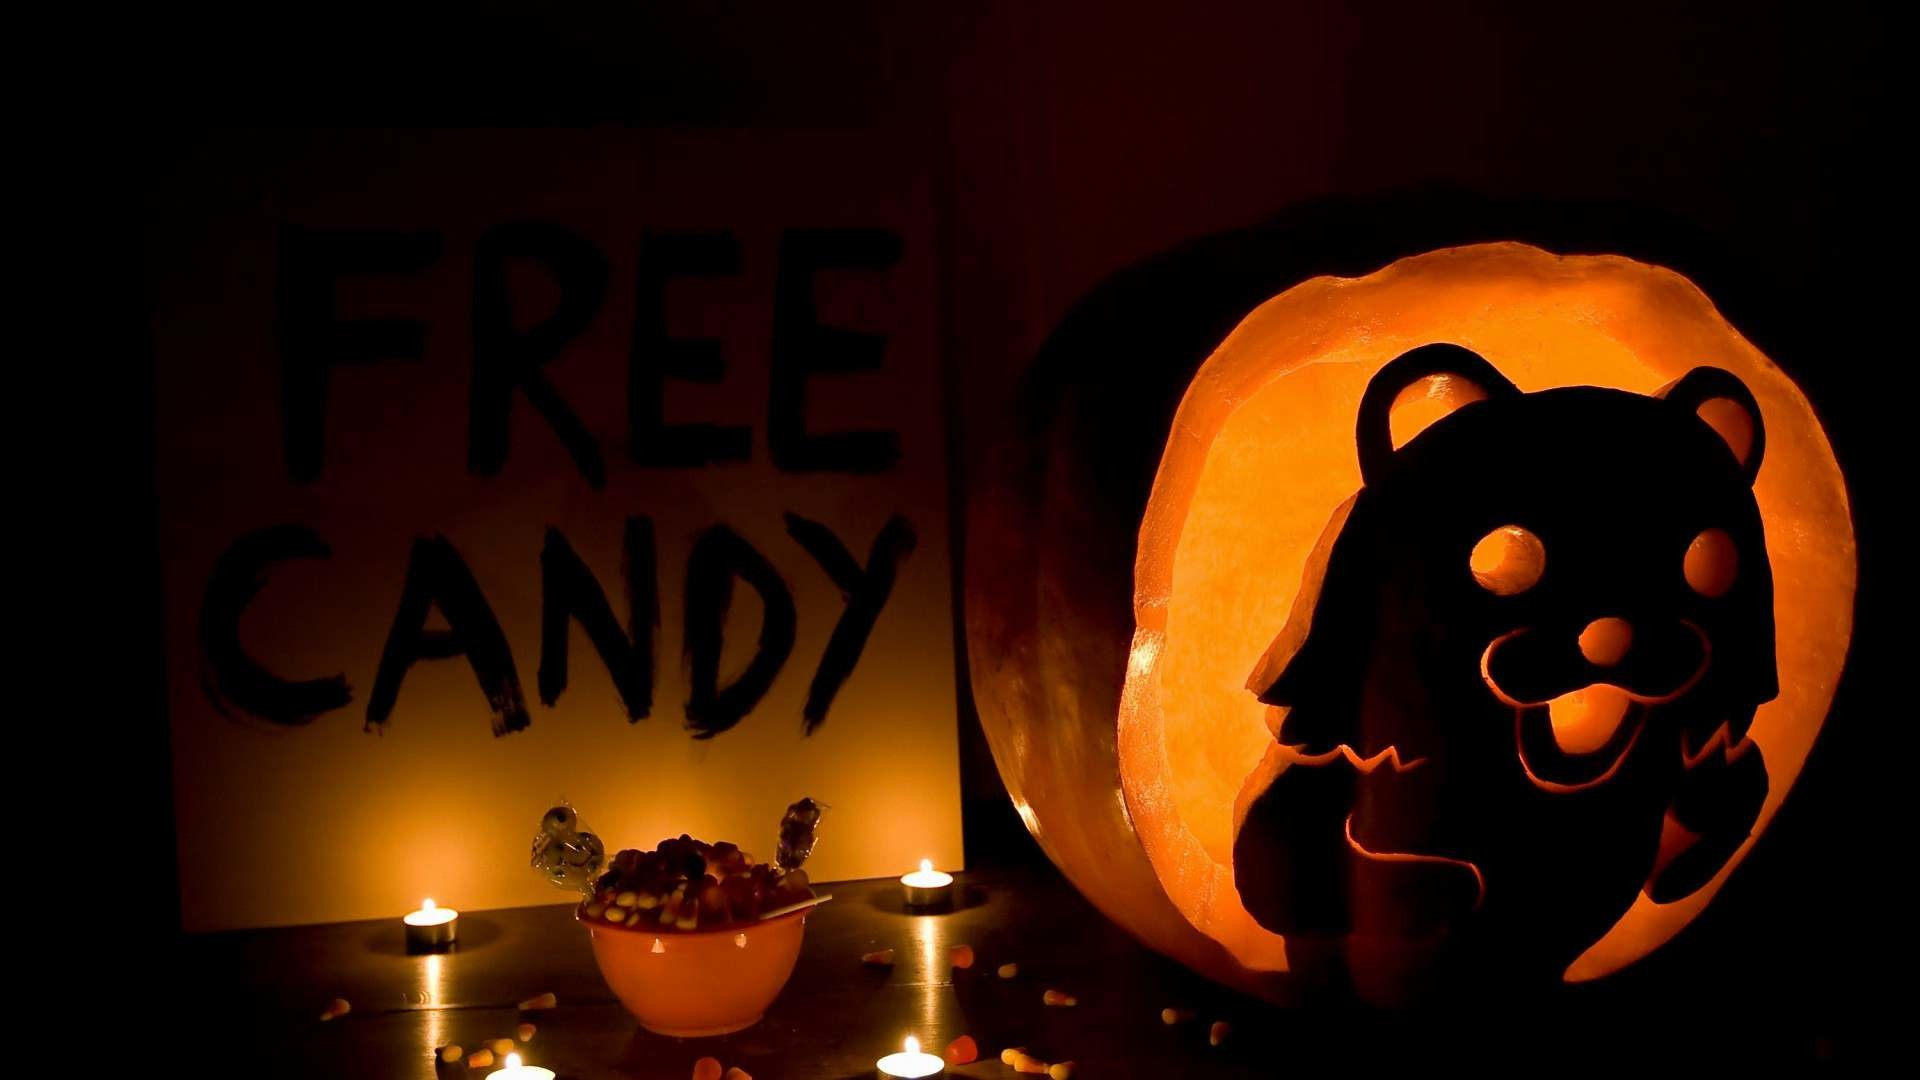 1920x1200 Spooky Halloween | Scary Halloween Wallpaper Pic #13